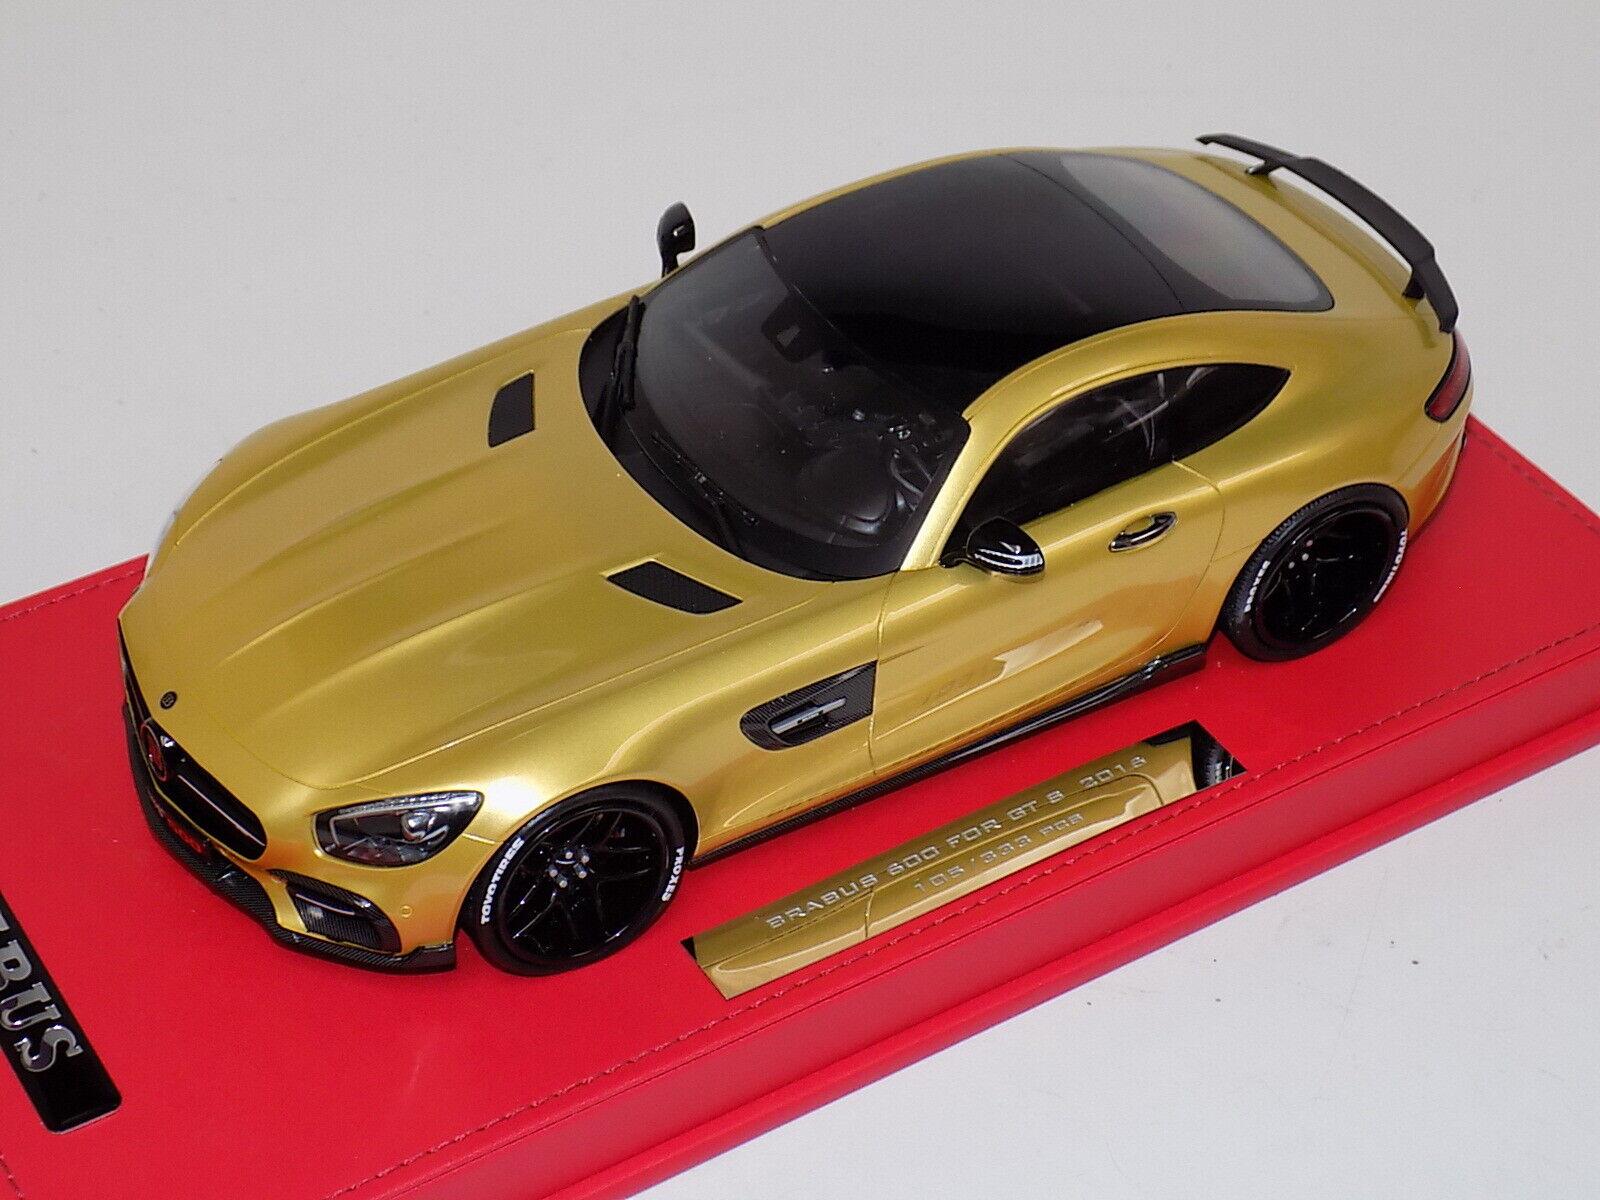 1 18 Minichamps Mercedes Brabus 600 for GT S 2016 Gold Leather base schwarz wheels